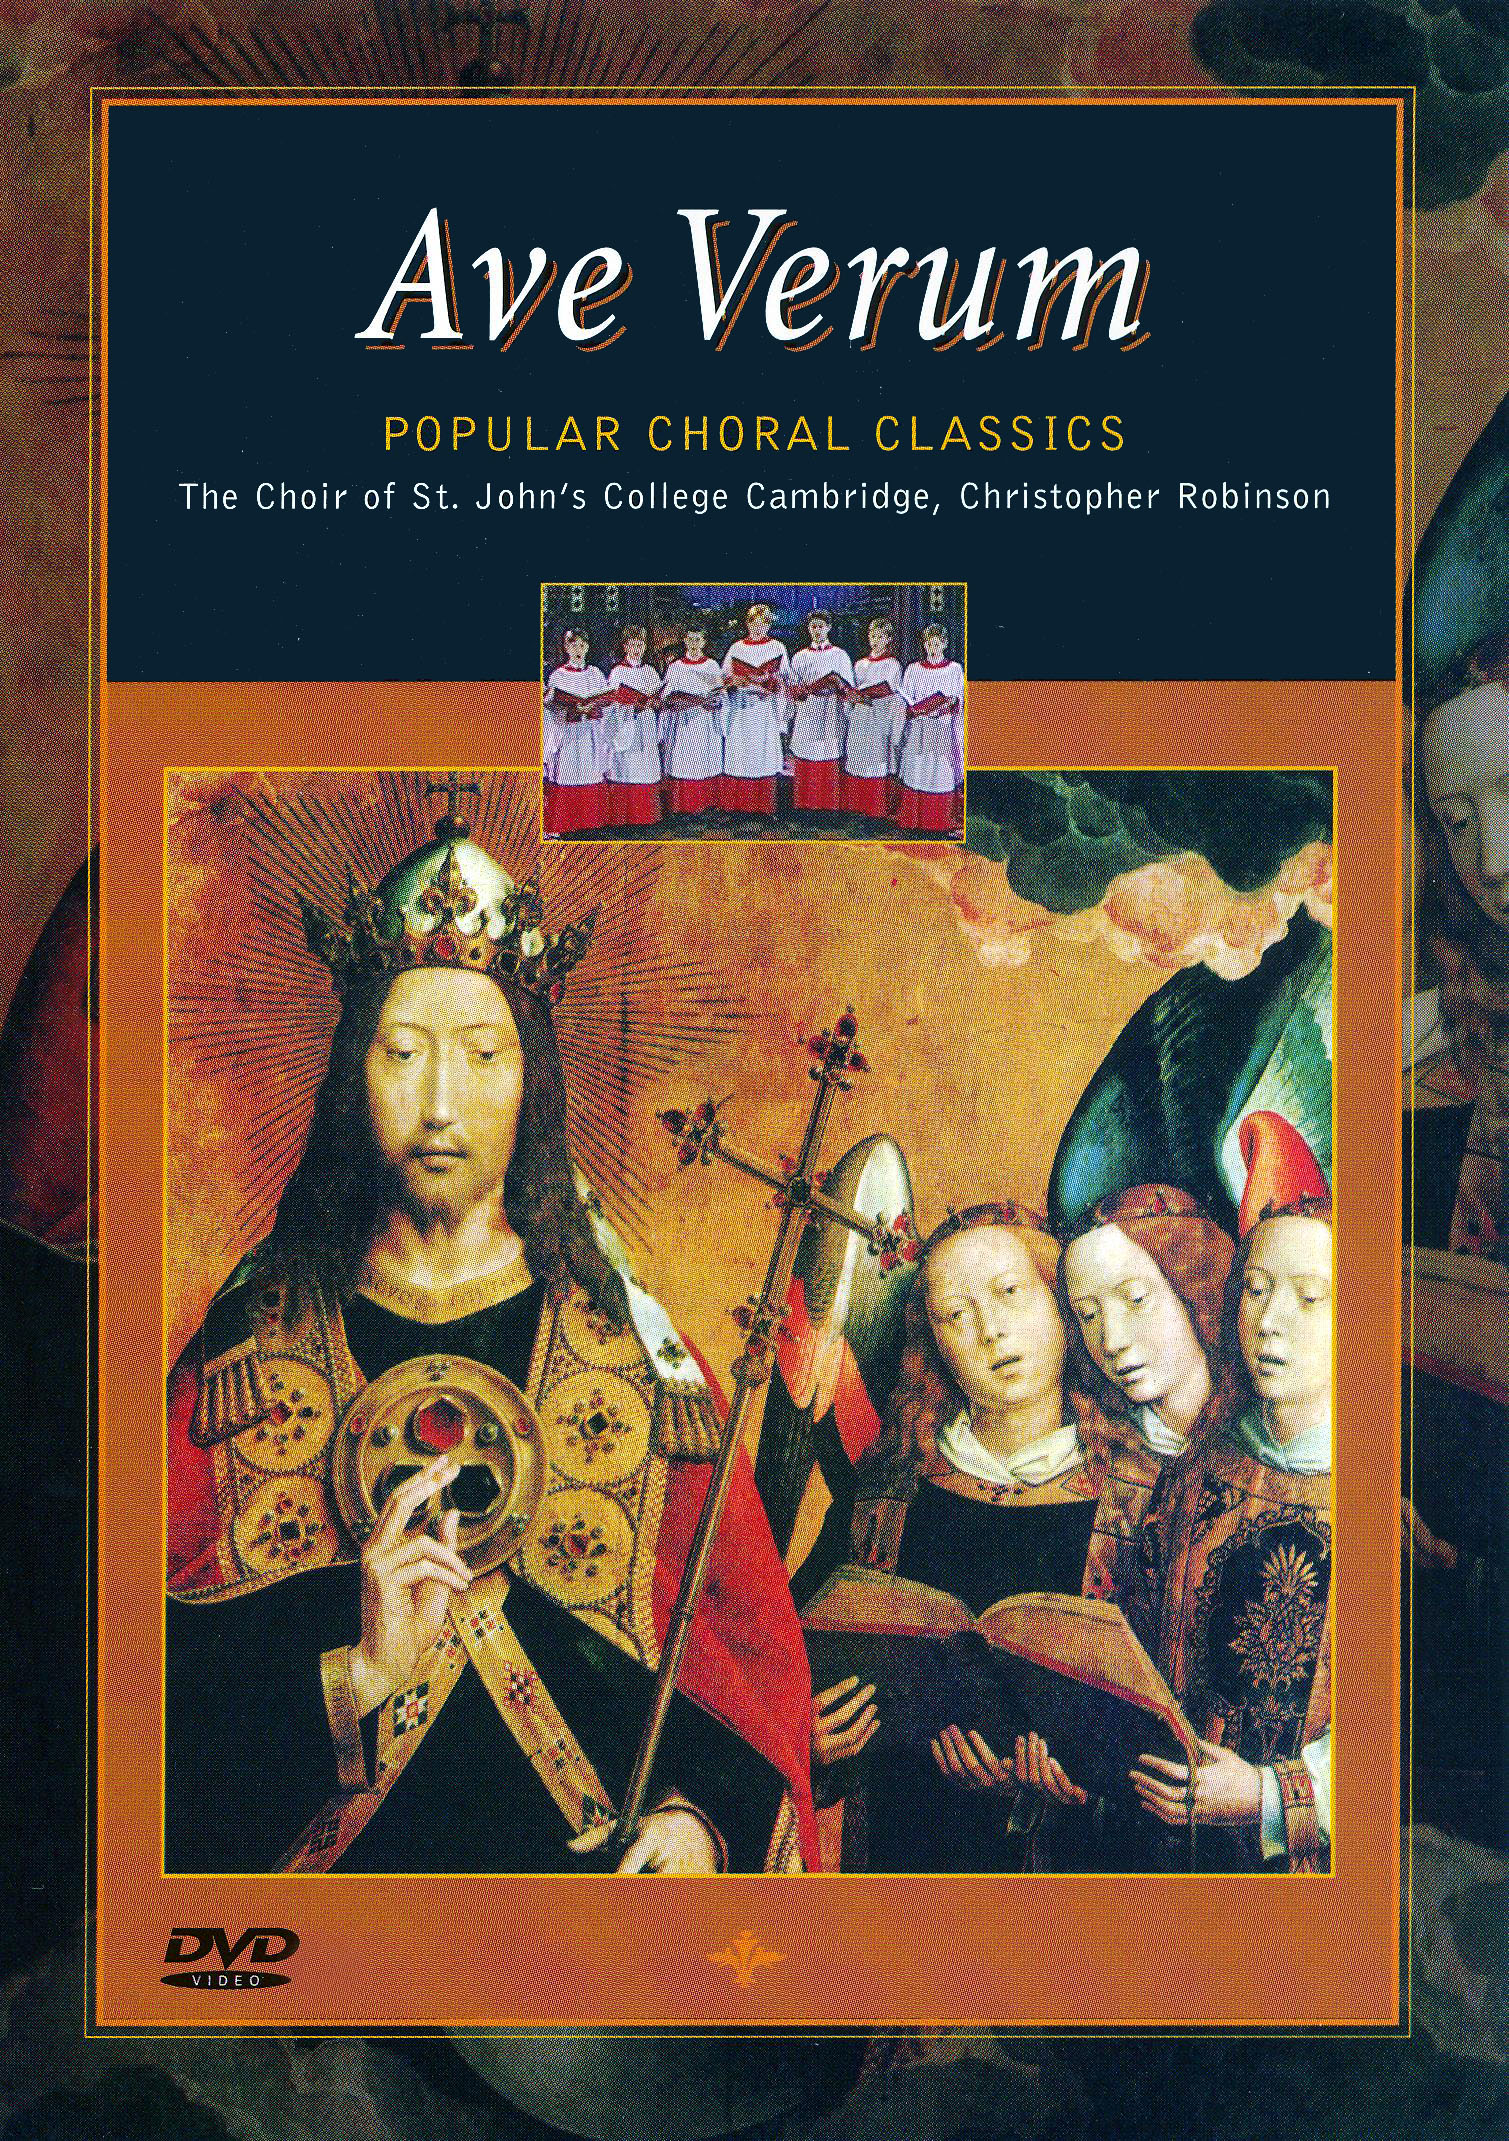 Choir of St. John's College, Cambridge: Ave Verum - Popular Choral Classics